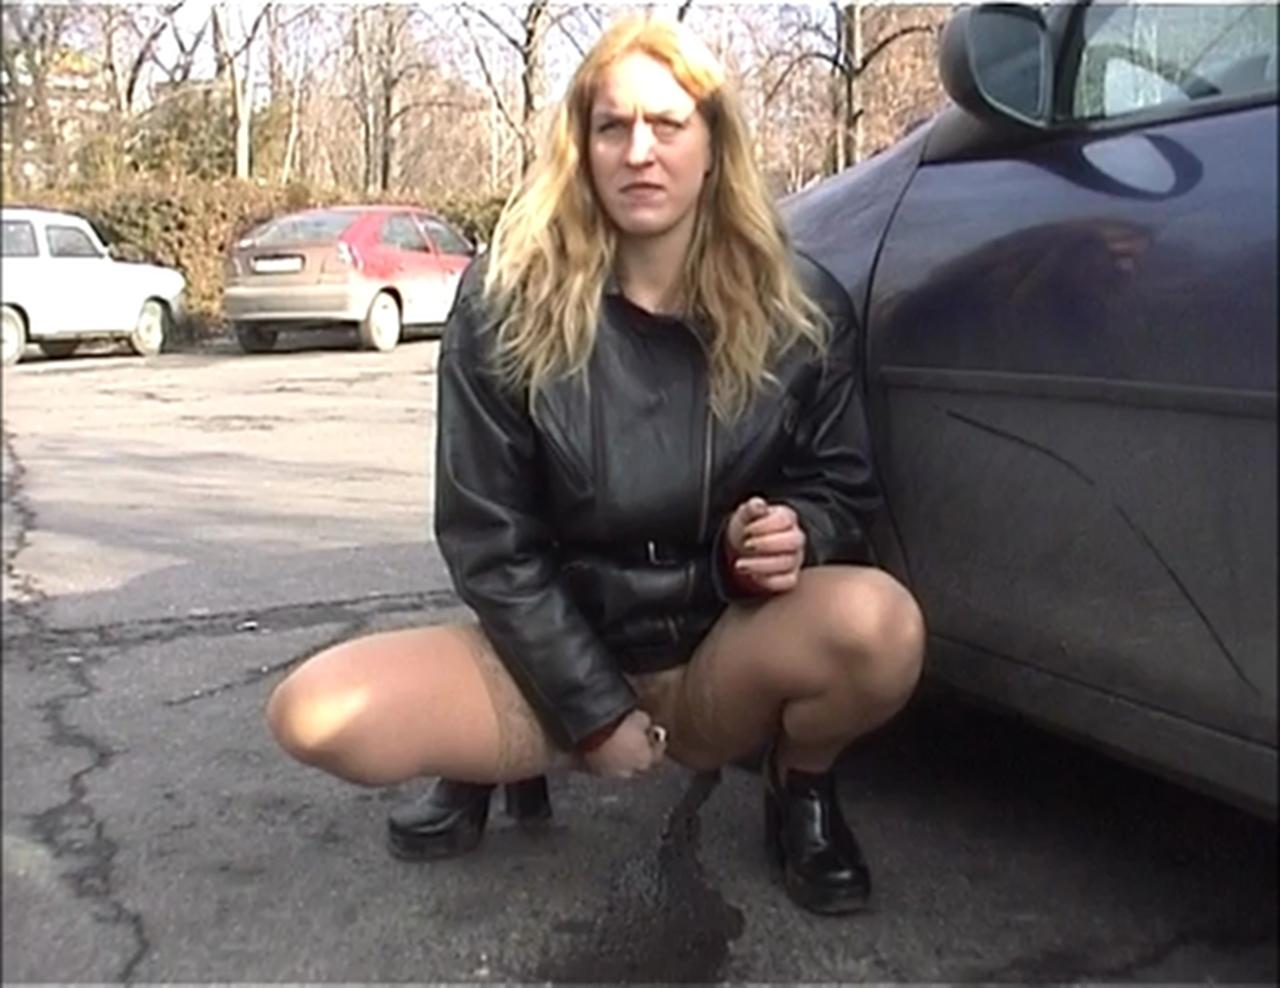 girl peeing in parking lot